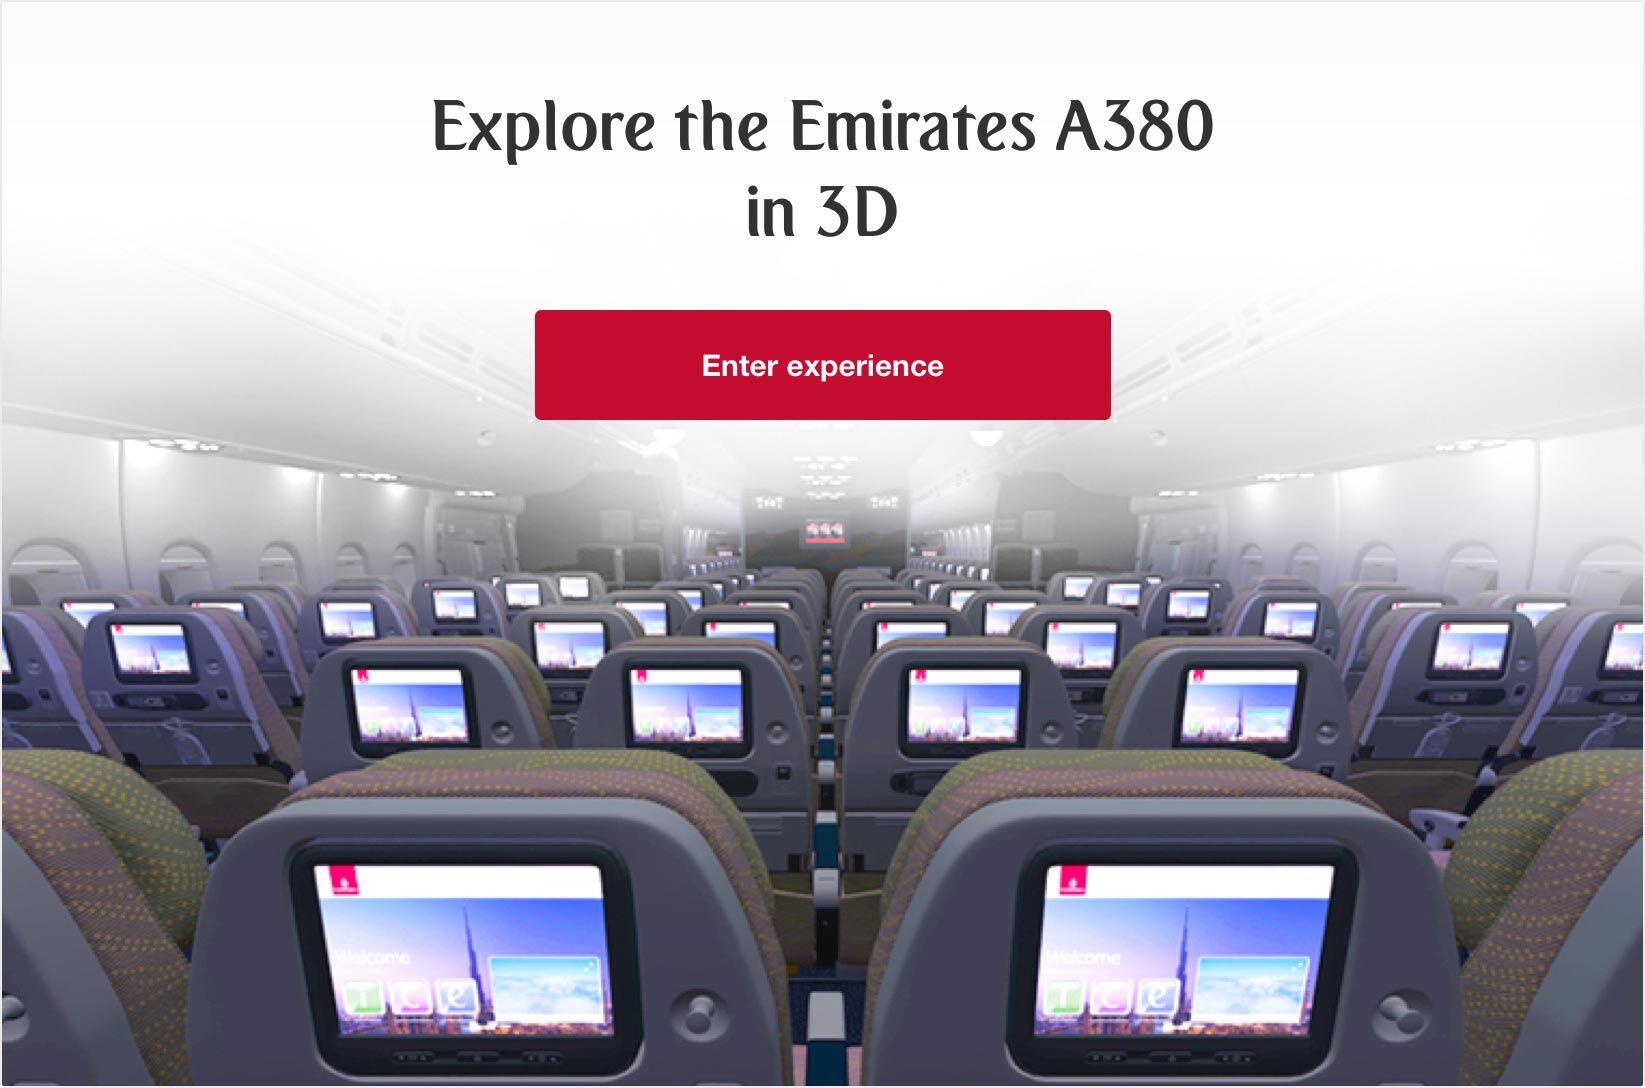 Emirates A380 | Our fleet | The Emirates Experience | Emirates Ireland